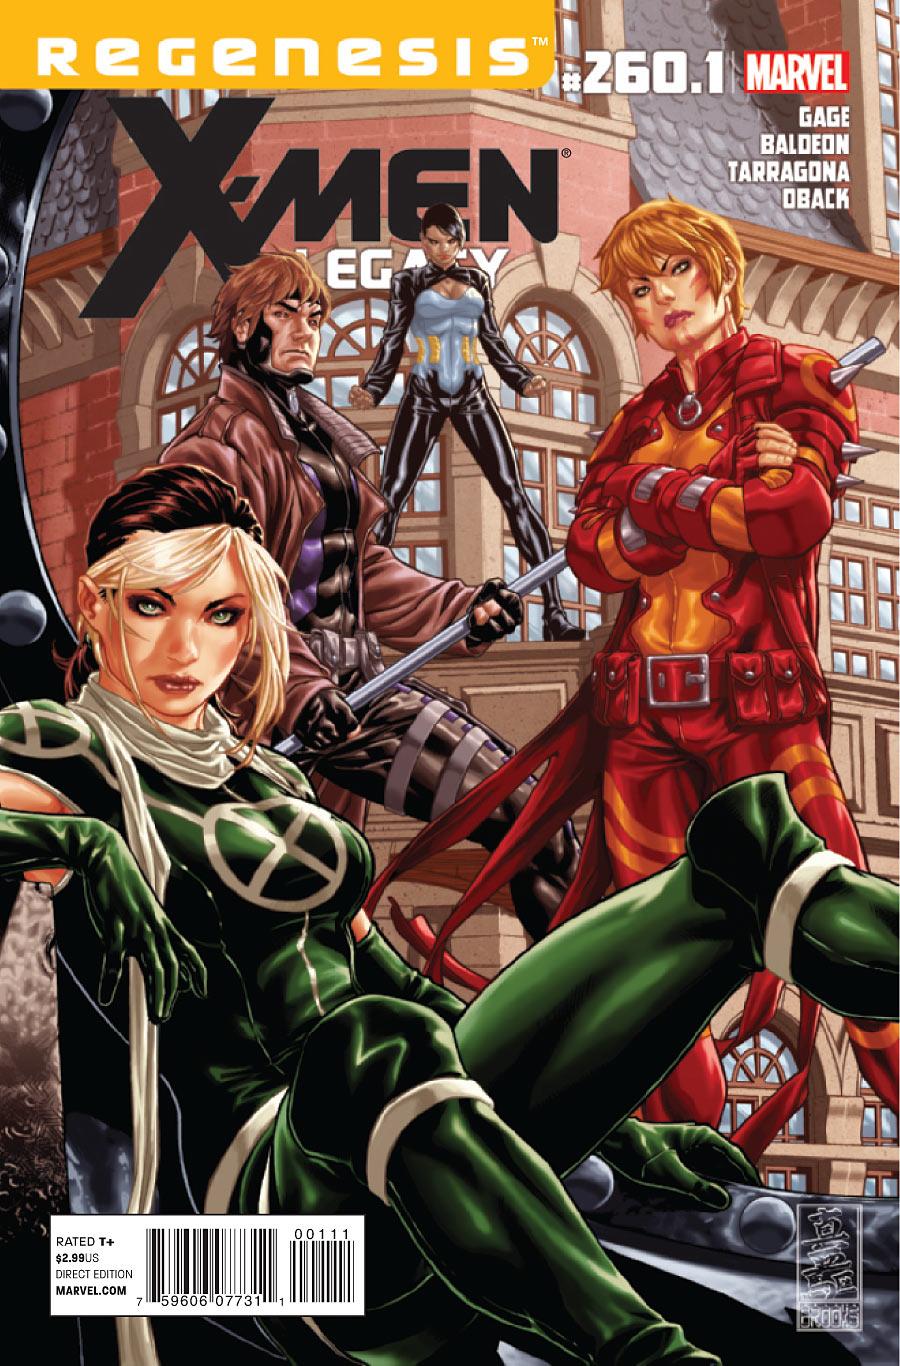 X-Men: Legacy Vol 1 260.1